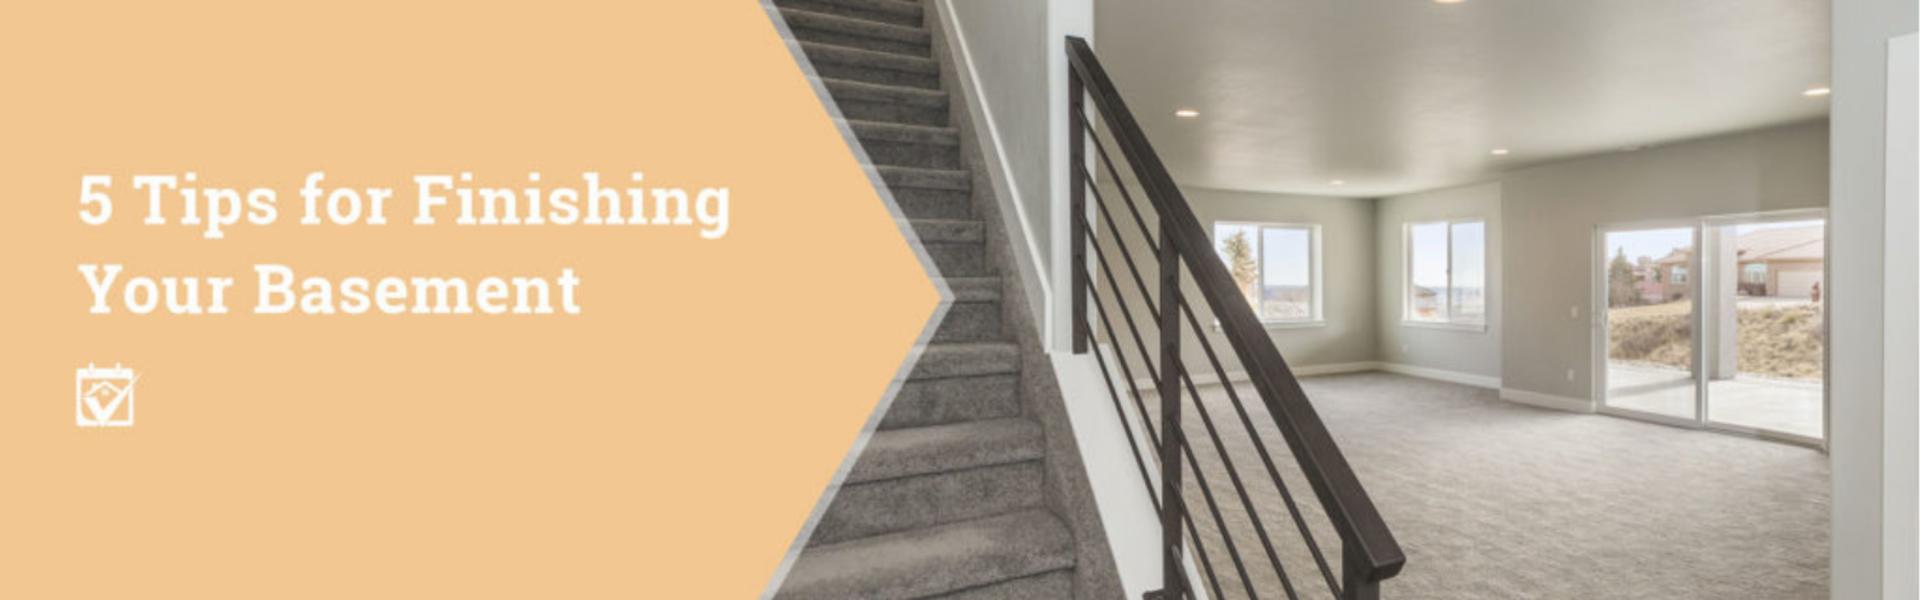 5 Tips for Finishing Your Basement